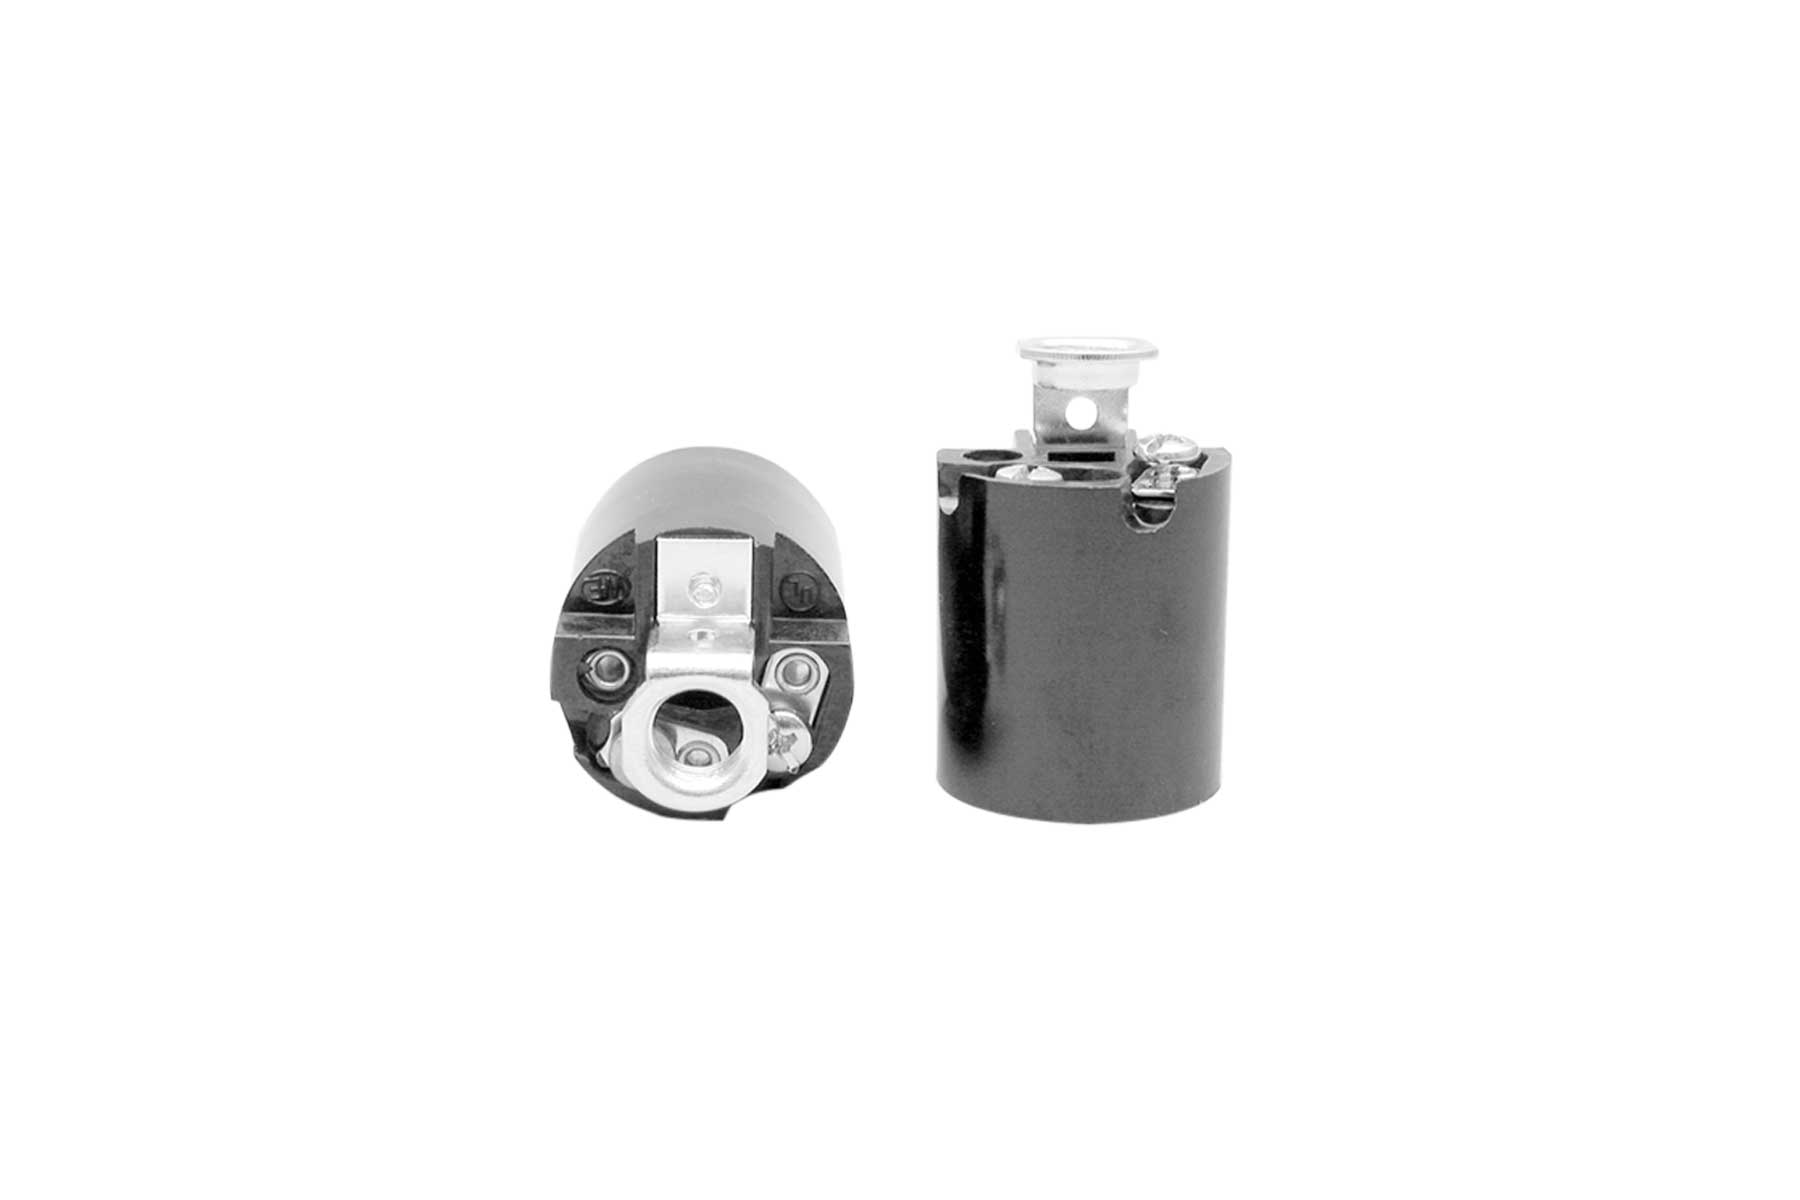 Medium Base Phenolic Keyless Incandescent Light Socket with Screw Terminals